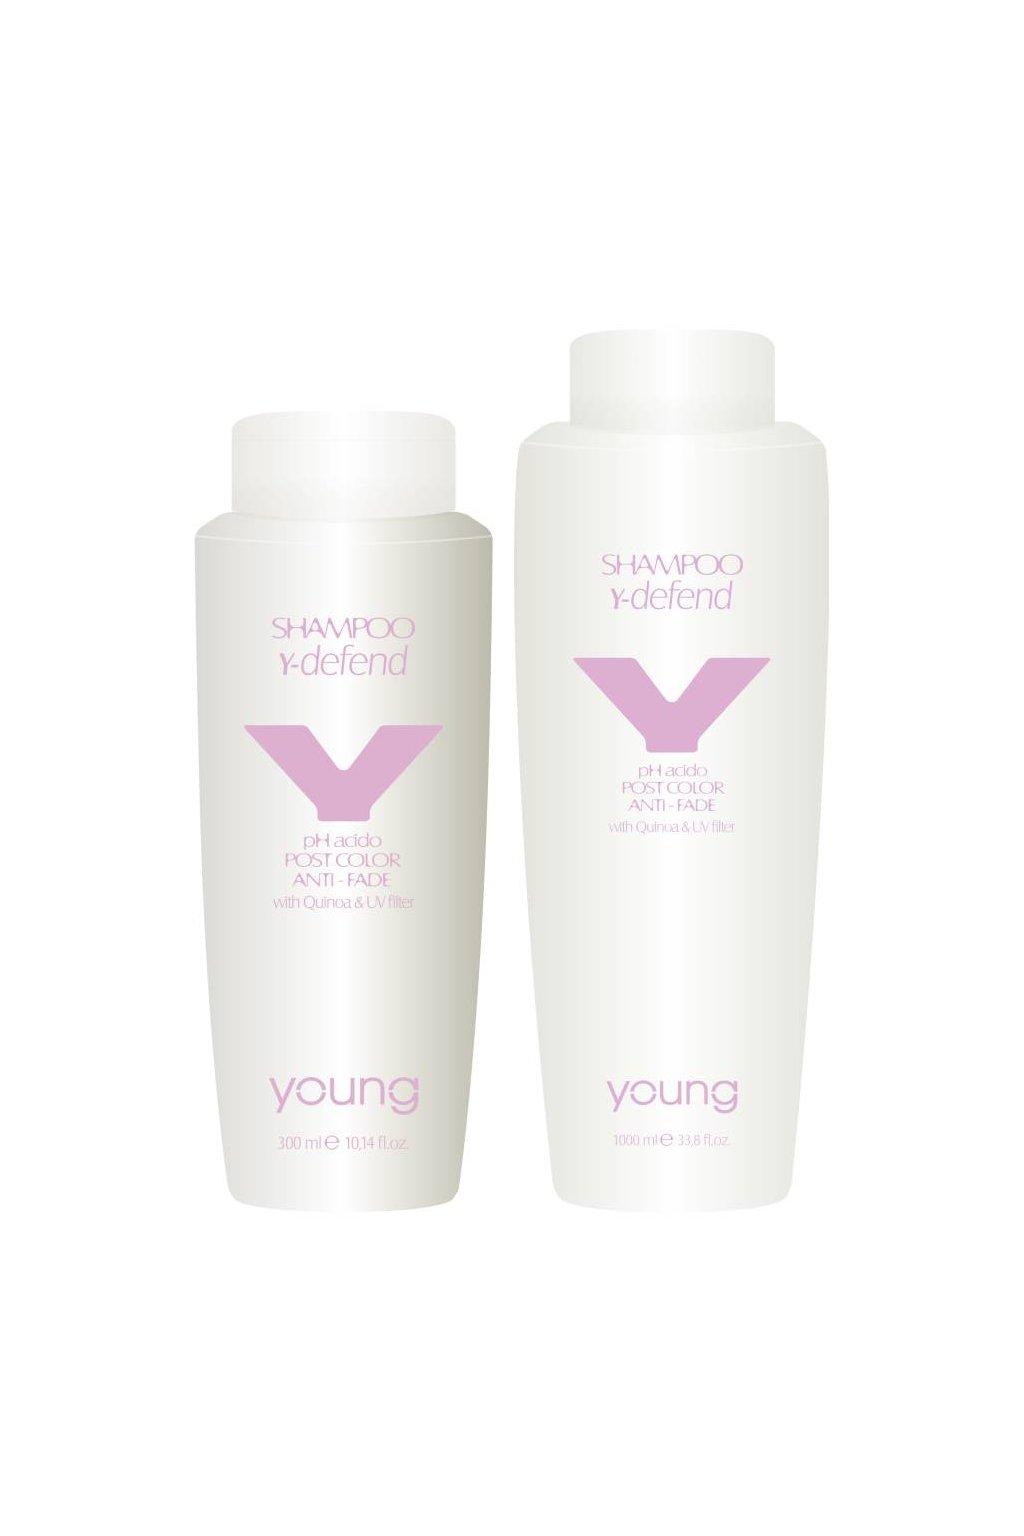 Young Y-DEFEND Šampon pro barvené vlasy s kyselým pH, quinoou a UV filtrem